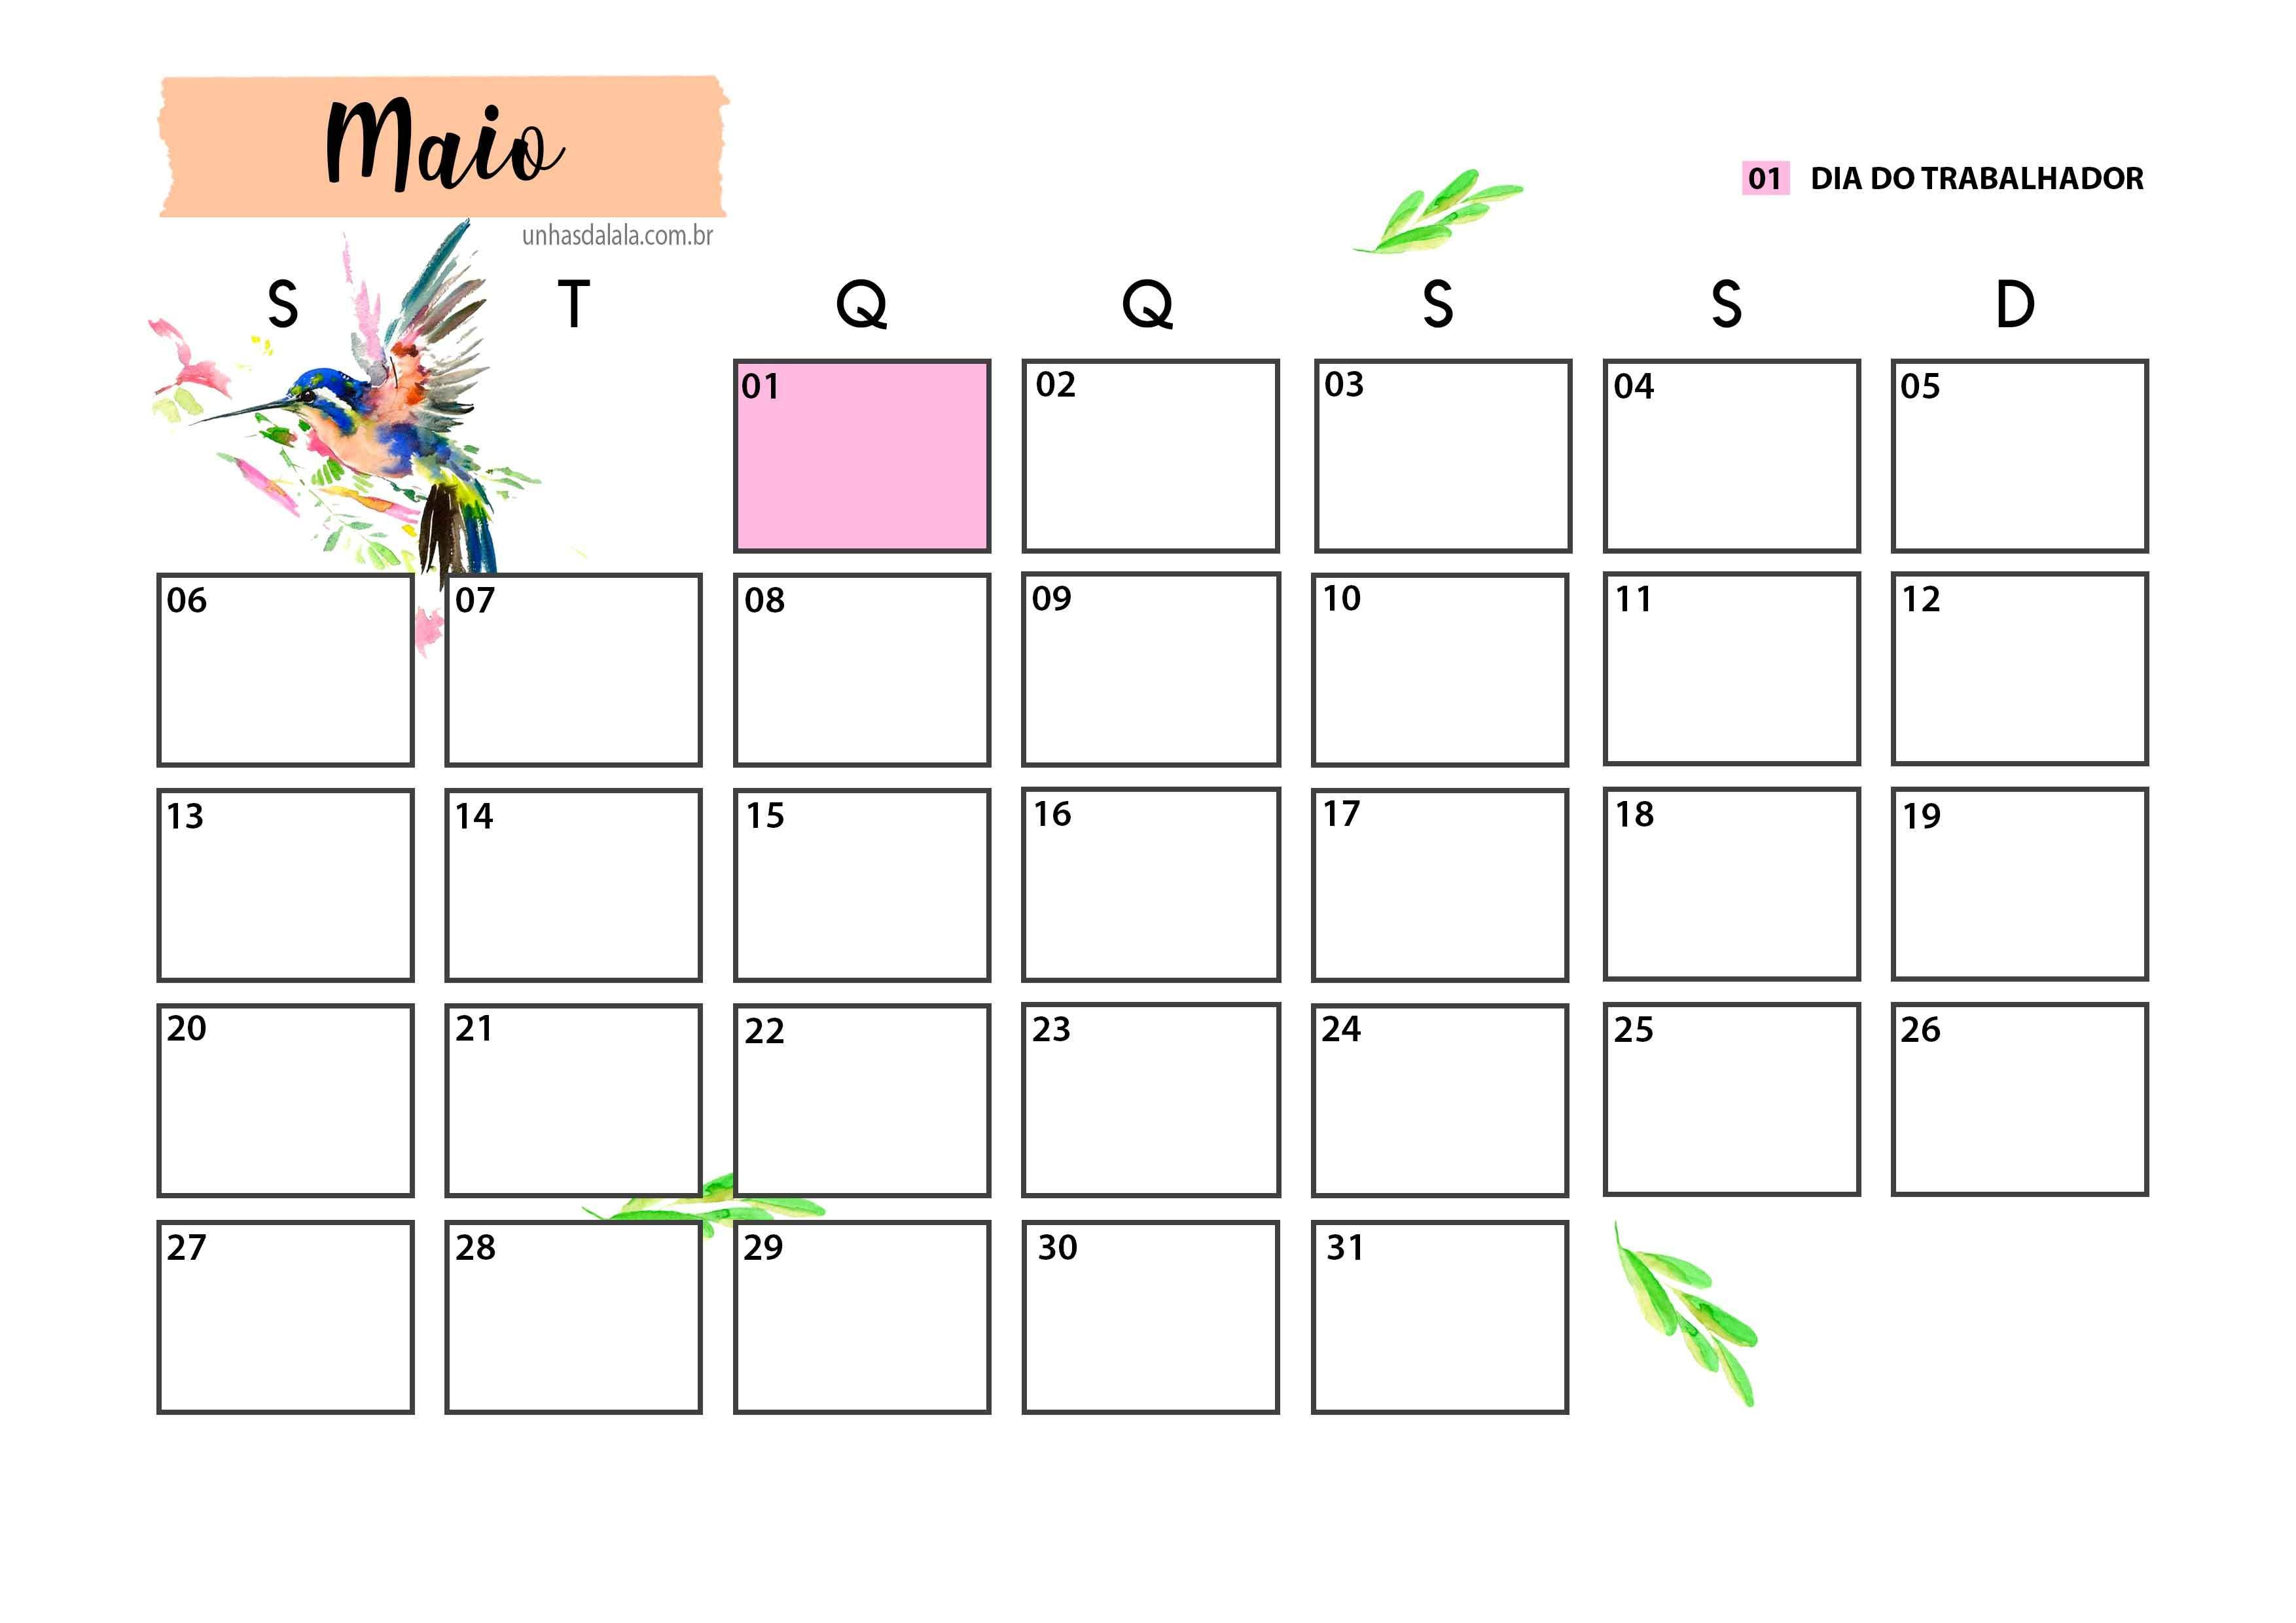 Calendario Escolar 2019 Portugal Actual Calendario Mes 2019 Para Imprimir Abril T Of Calendario Escolar 2019 Portugal Recientes Anahi Anahi9171 On Pinterest